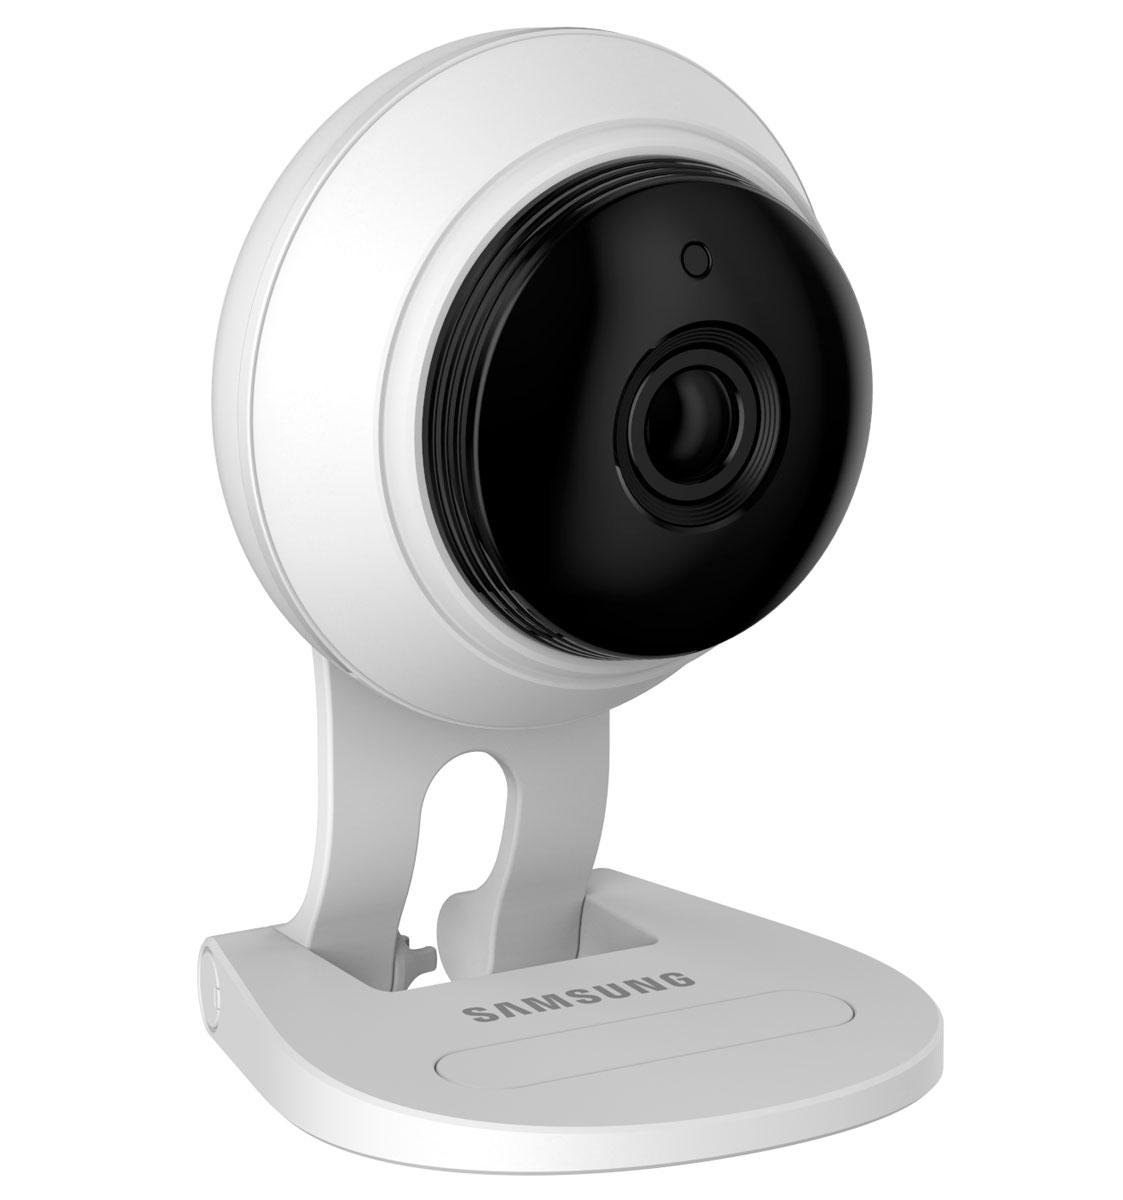 Samsung Видеоняня SmartCam SNH-C6417BN -  Радио и видеоняни